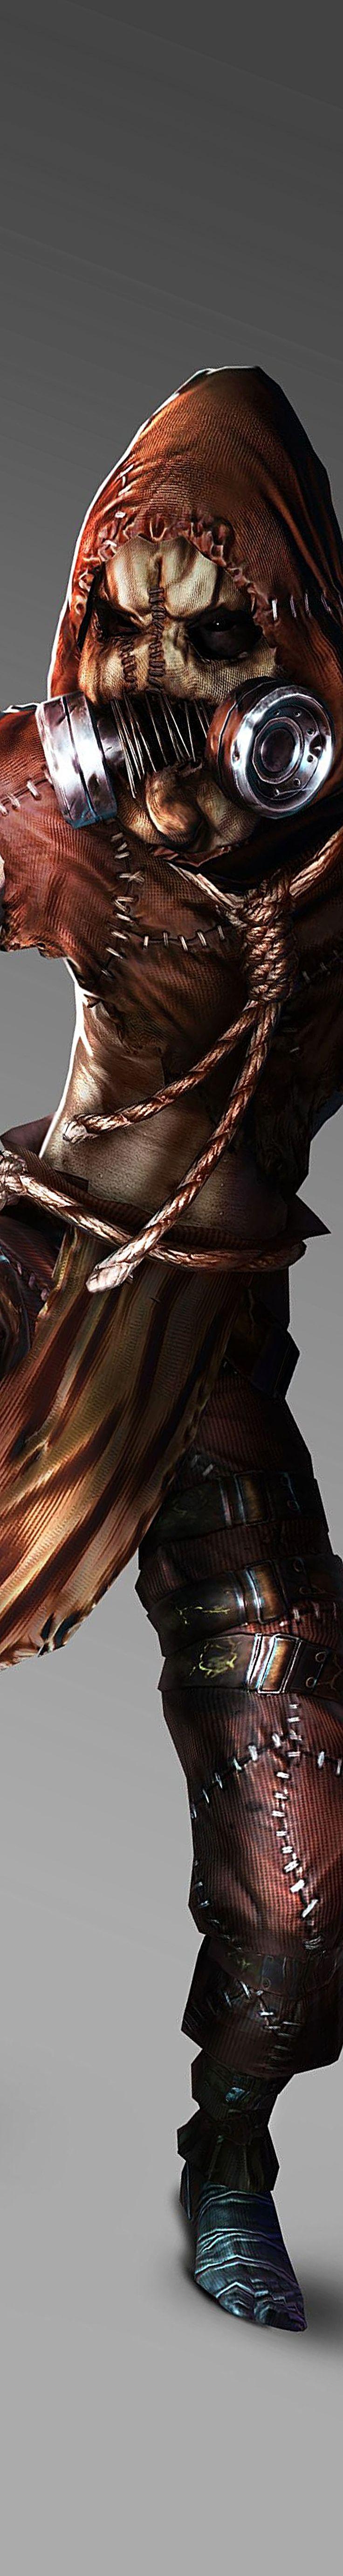 Scarecrow Arkham Asylum..... ❤❤❤❤❤❤❤❤❤❤❤❤❤❤❤❤❤❤❤❤❤❤❤❤ *twitch* fear....